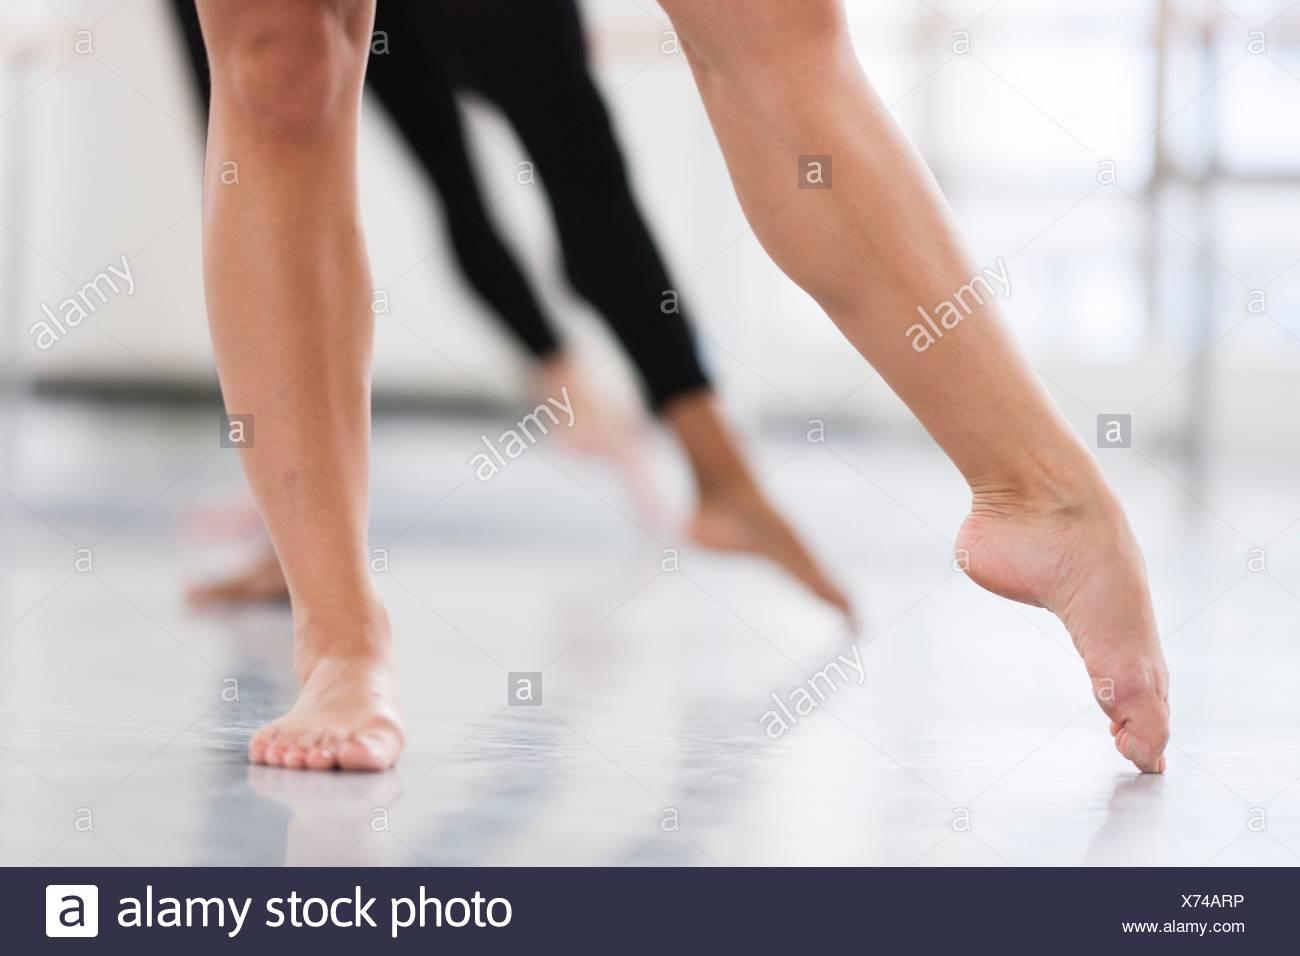 Dancers bare feet en pointe - Stock Image